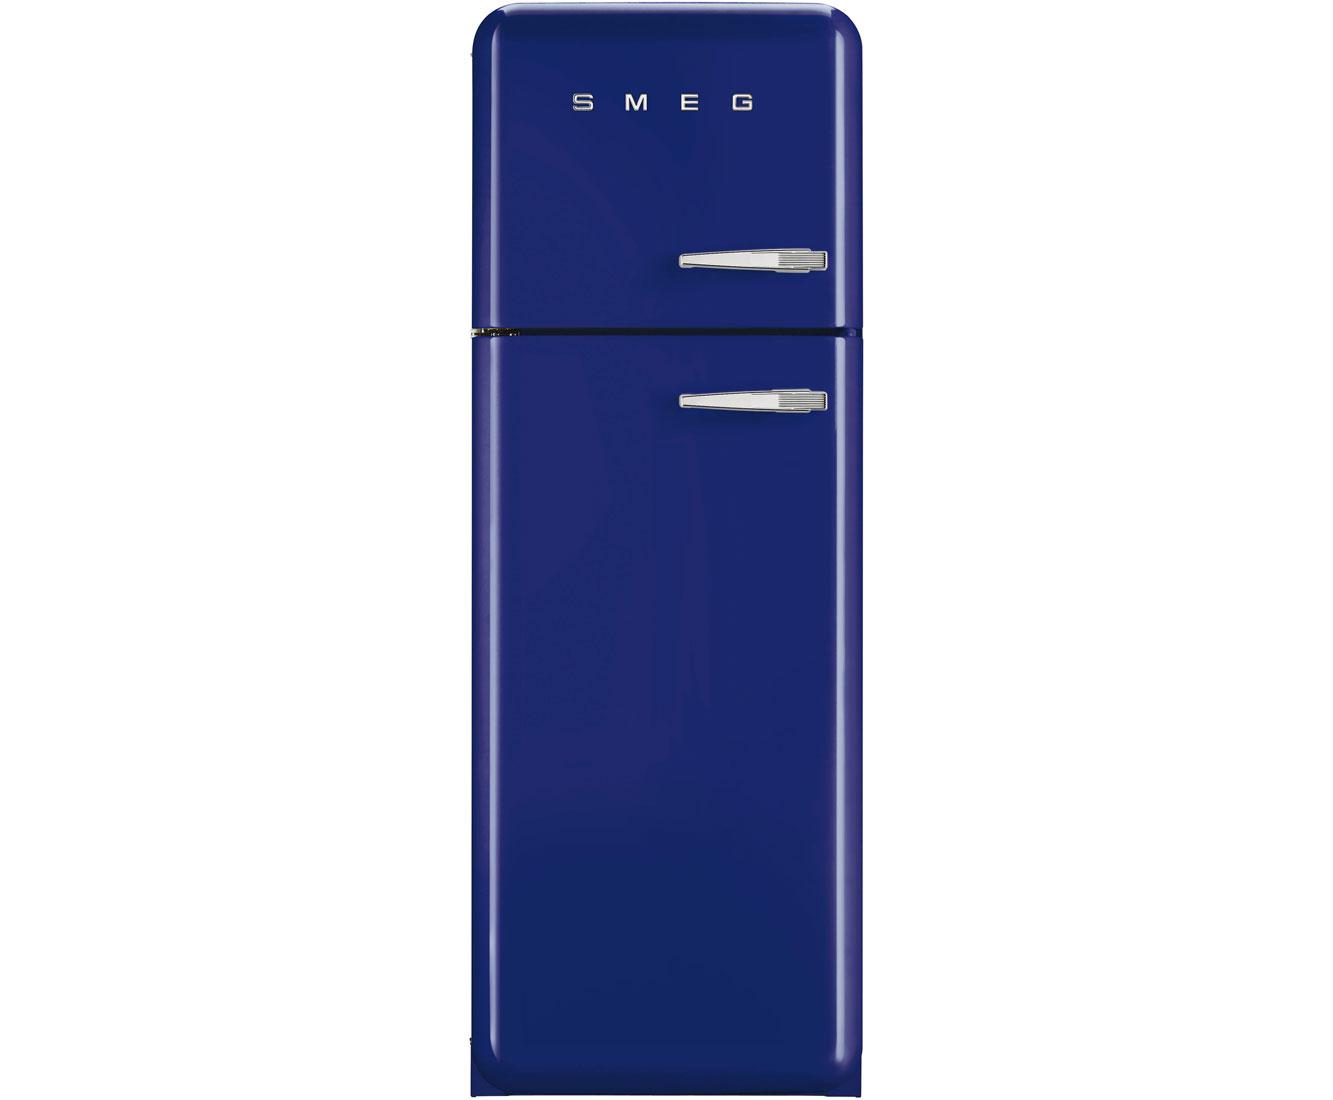 Blue fridge freezer shop for cheap fridge freezers and for Smeg fridge